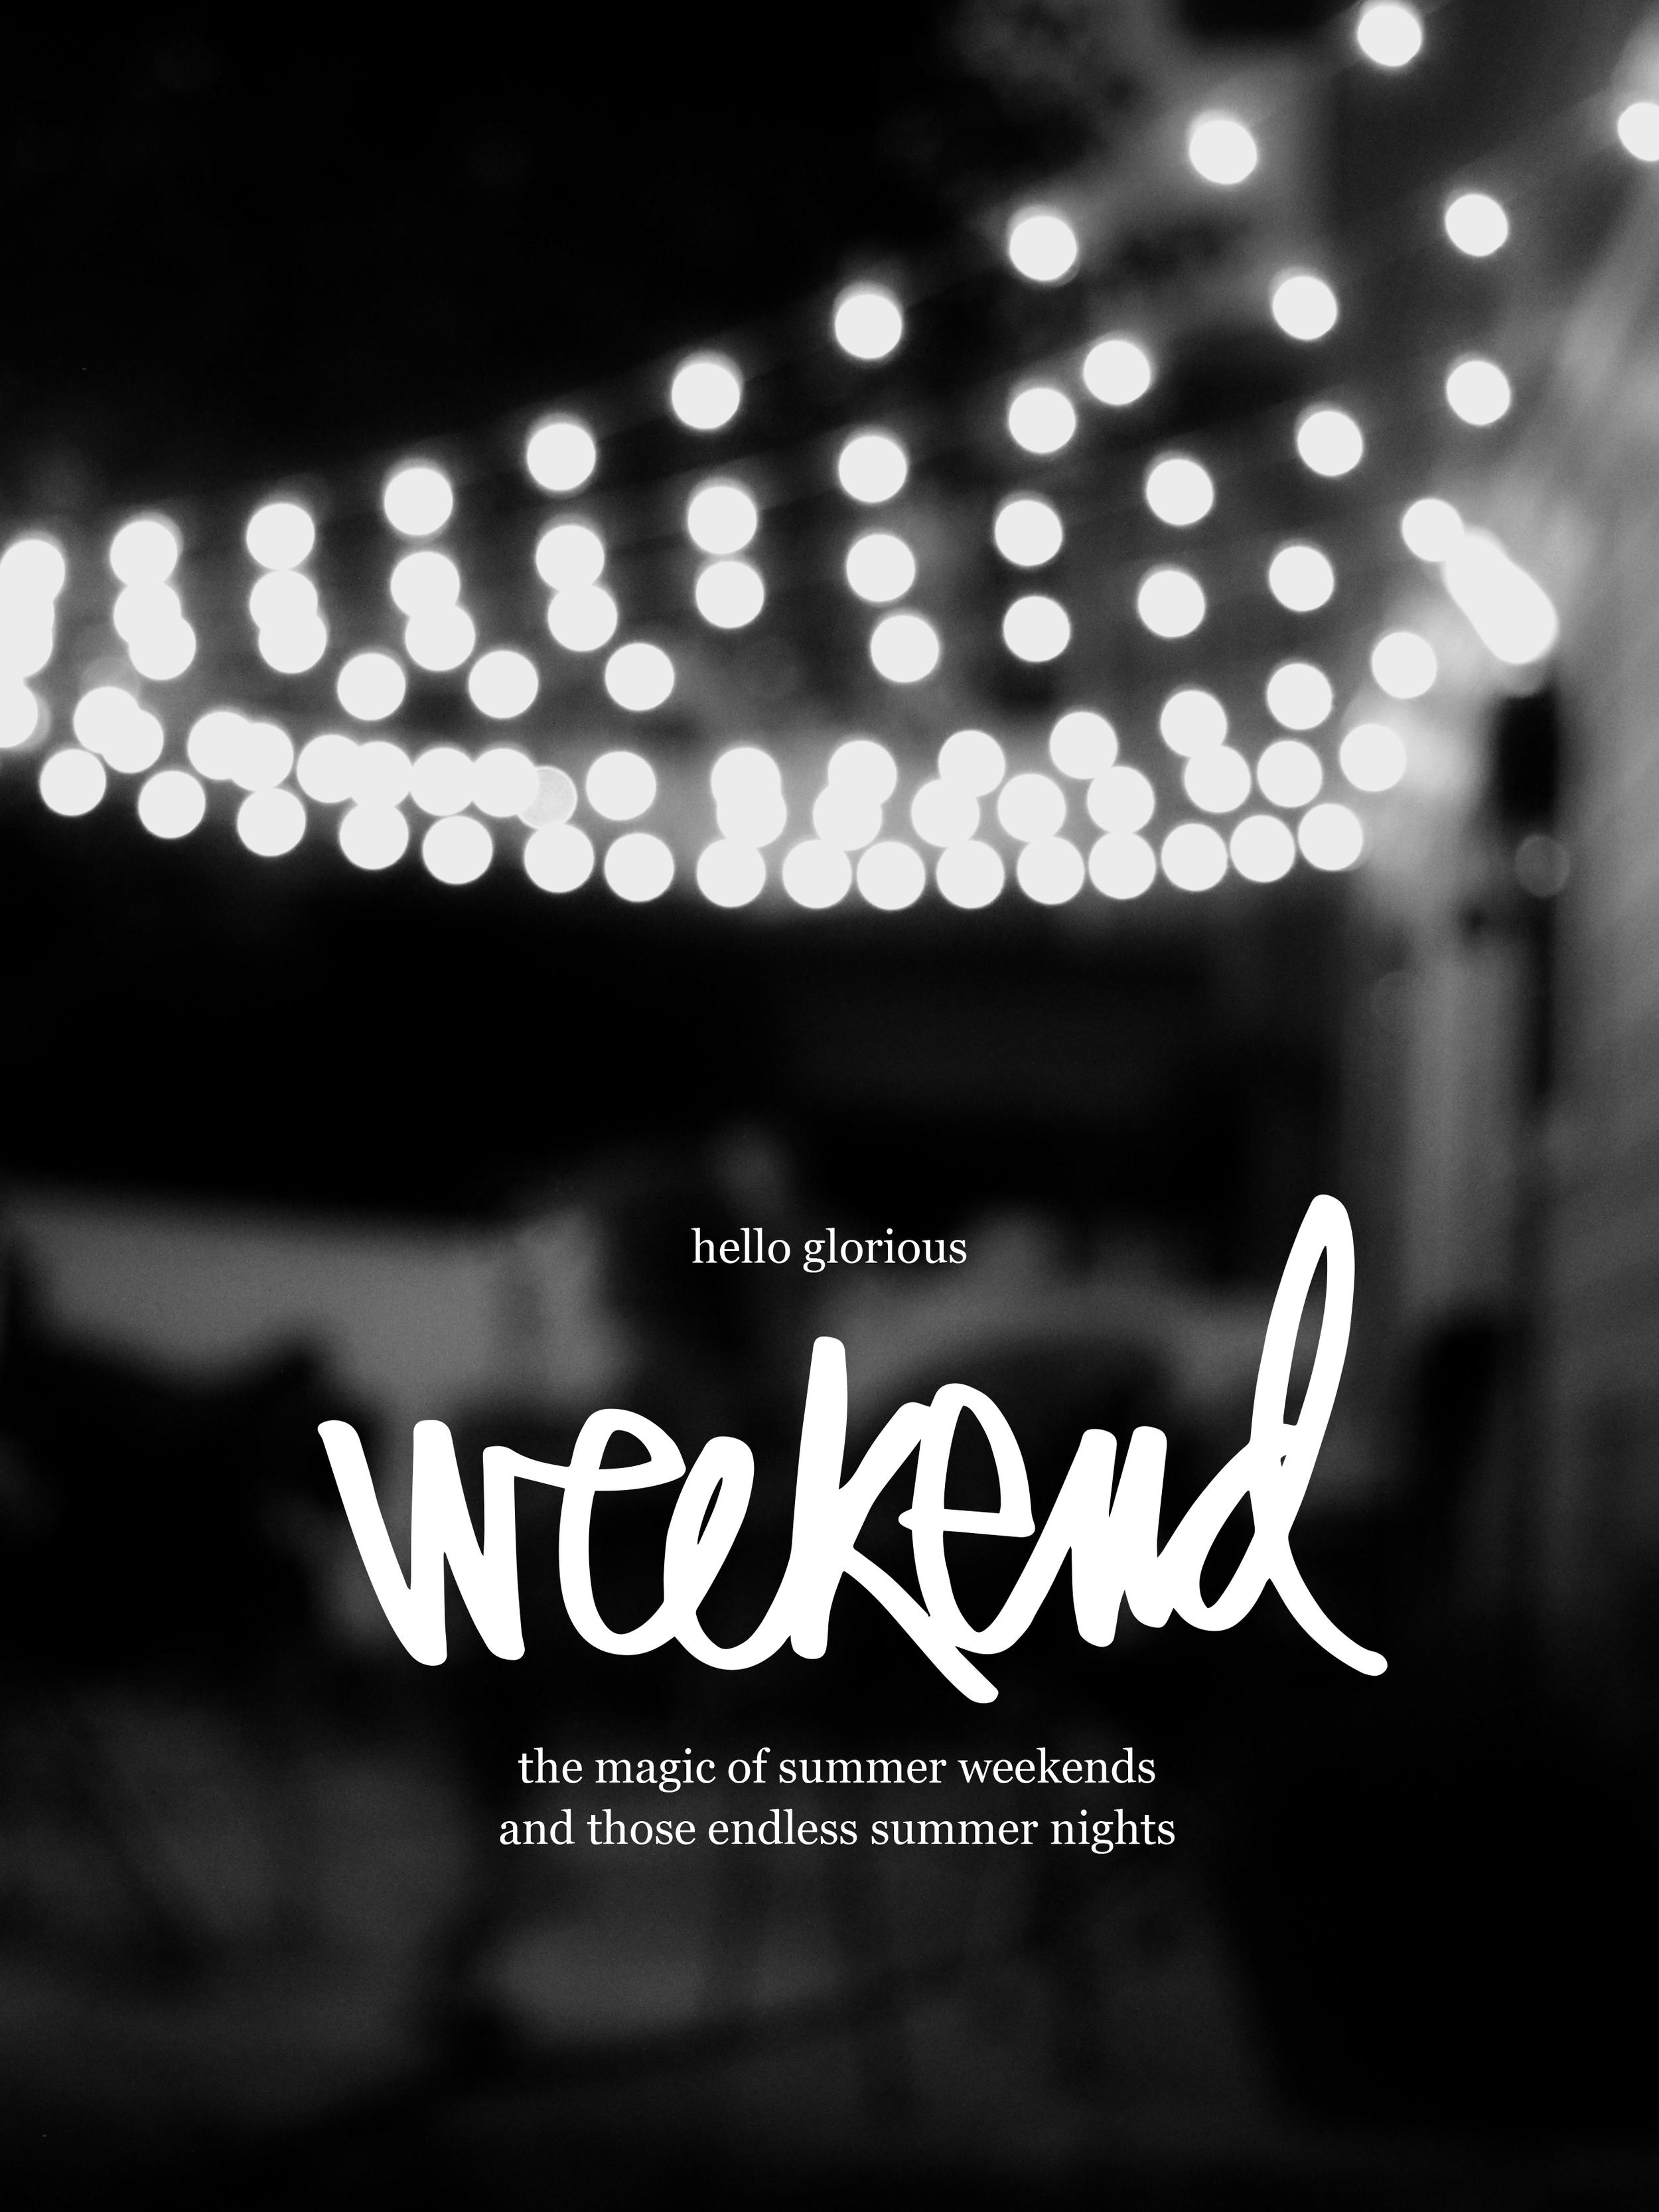 WeekendLove_lefttside.jpg